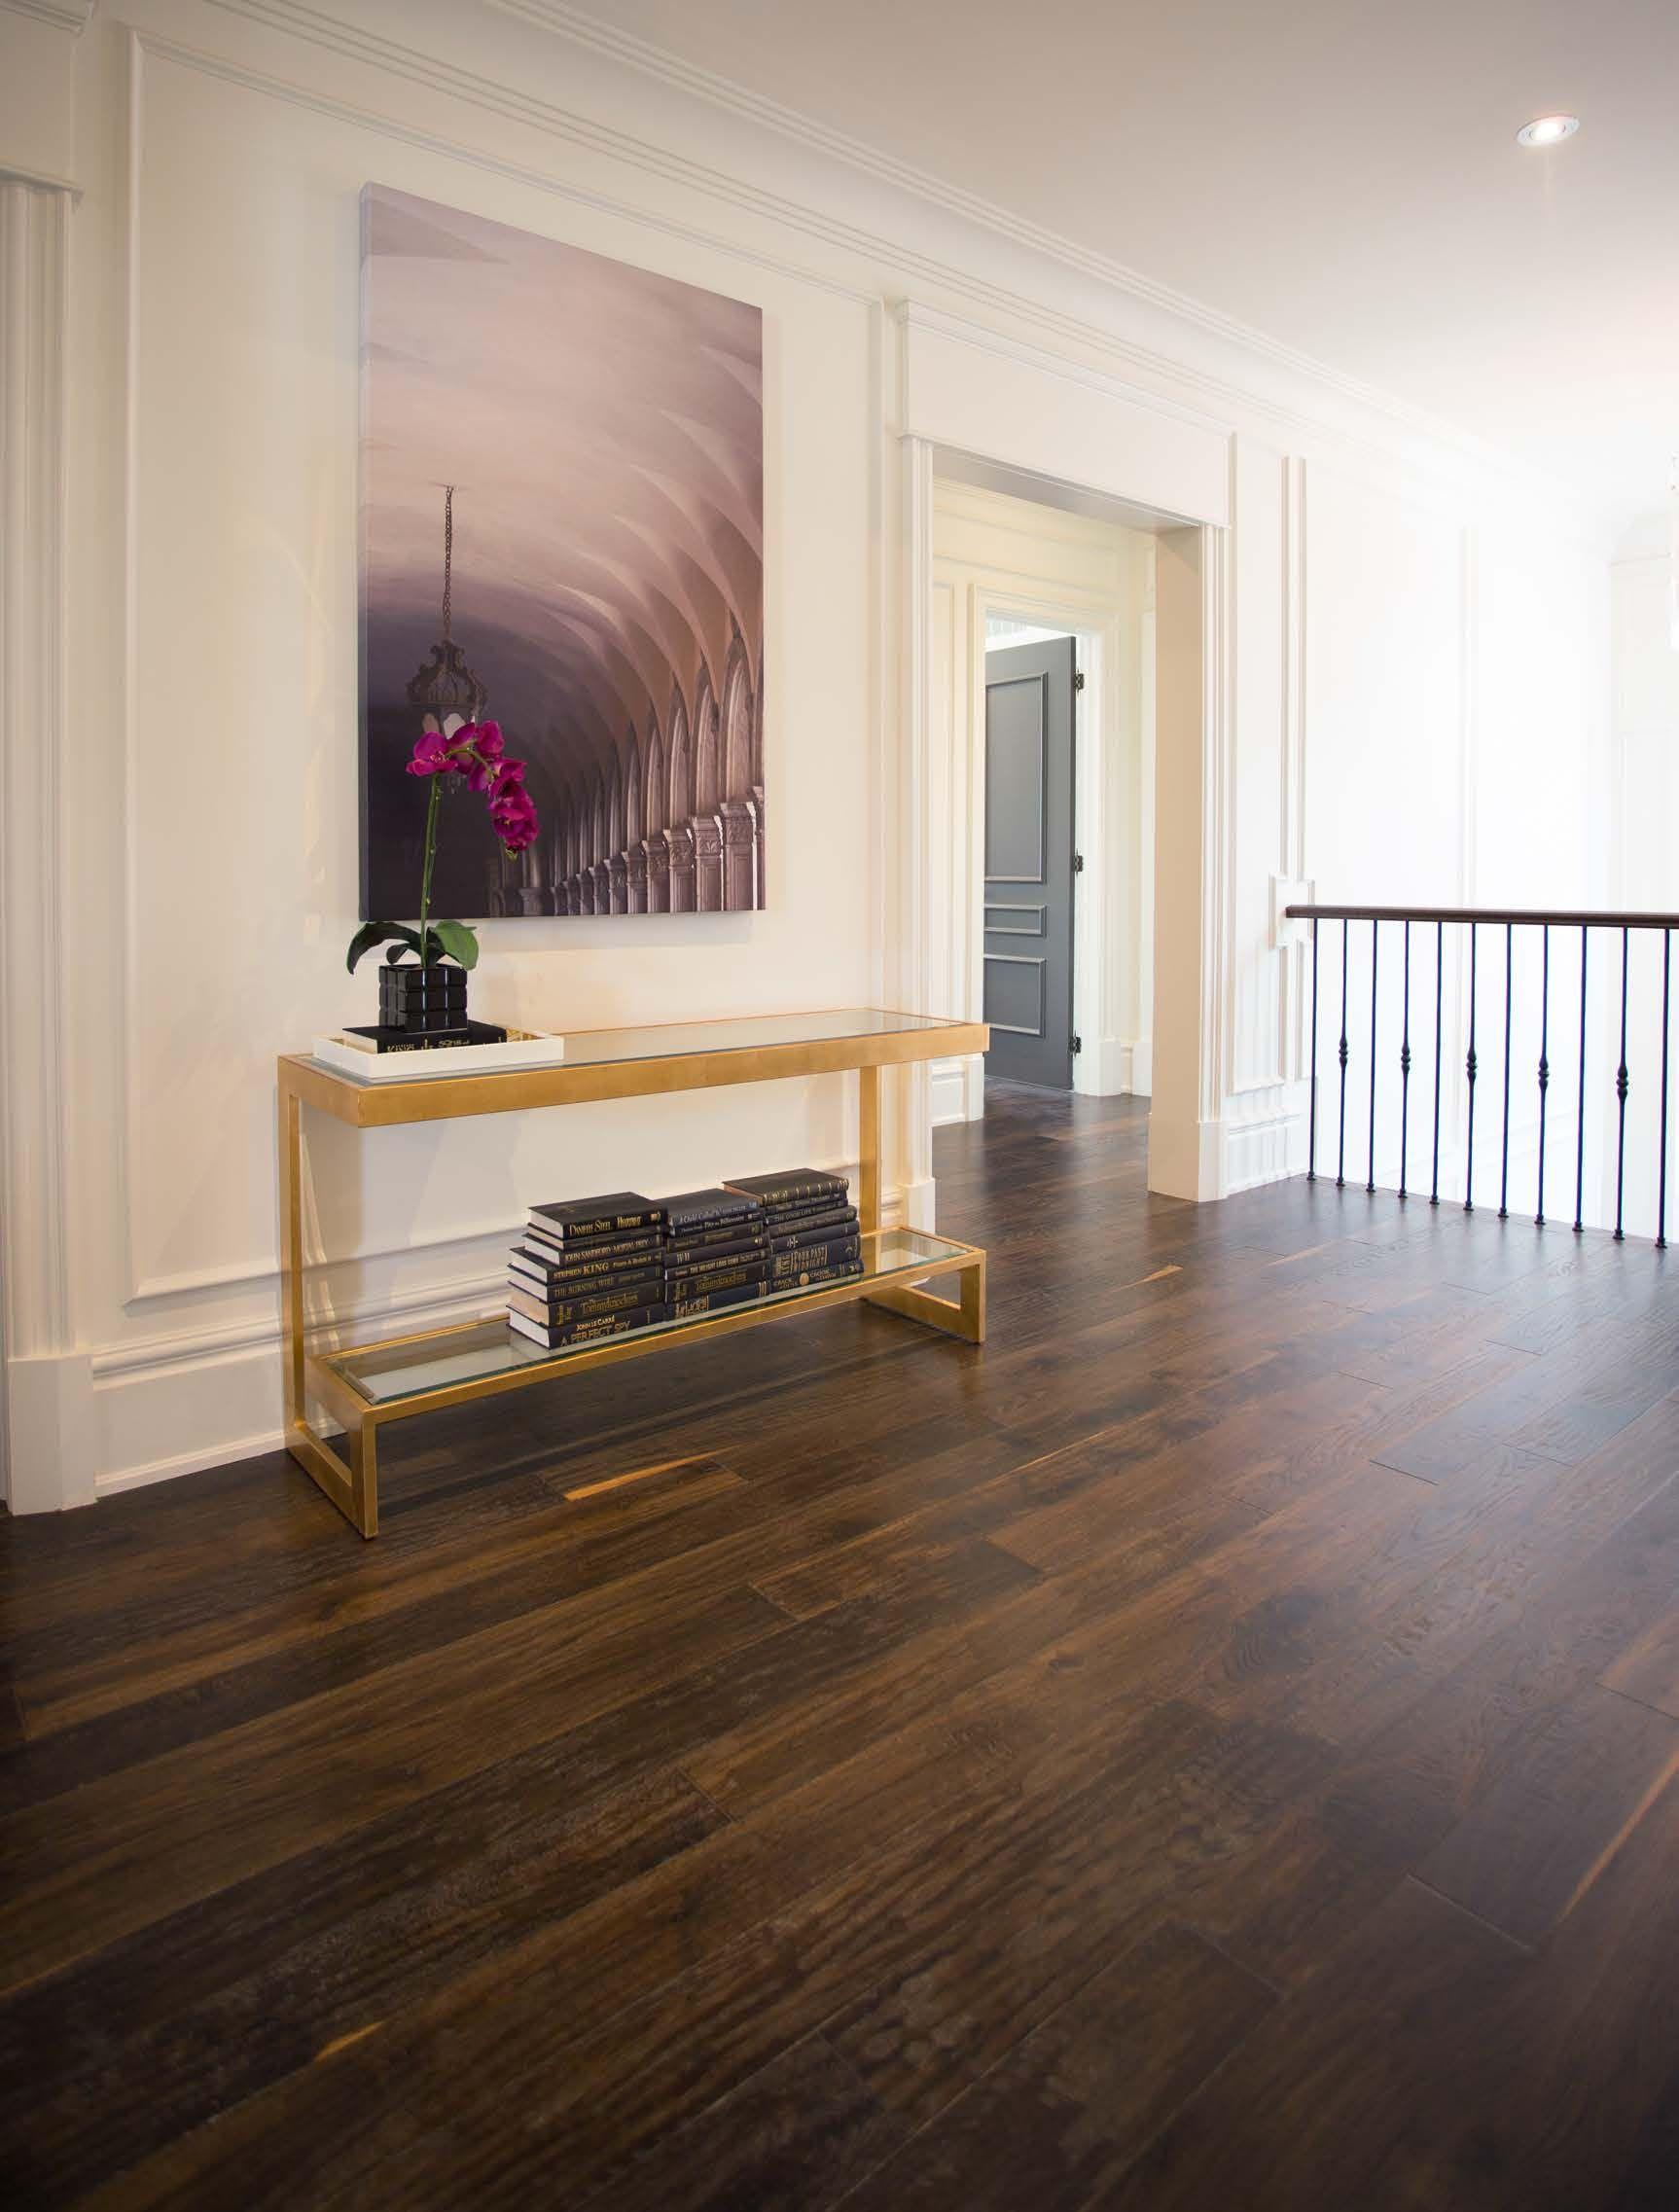 hardwood flooring markham of markham flooring ottawa markhamflooring on pinterest regarding 276f1b17746f05a6ef54b2d6e2bffeb1